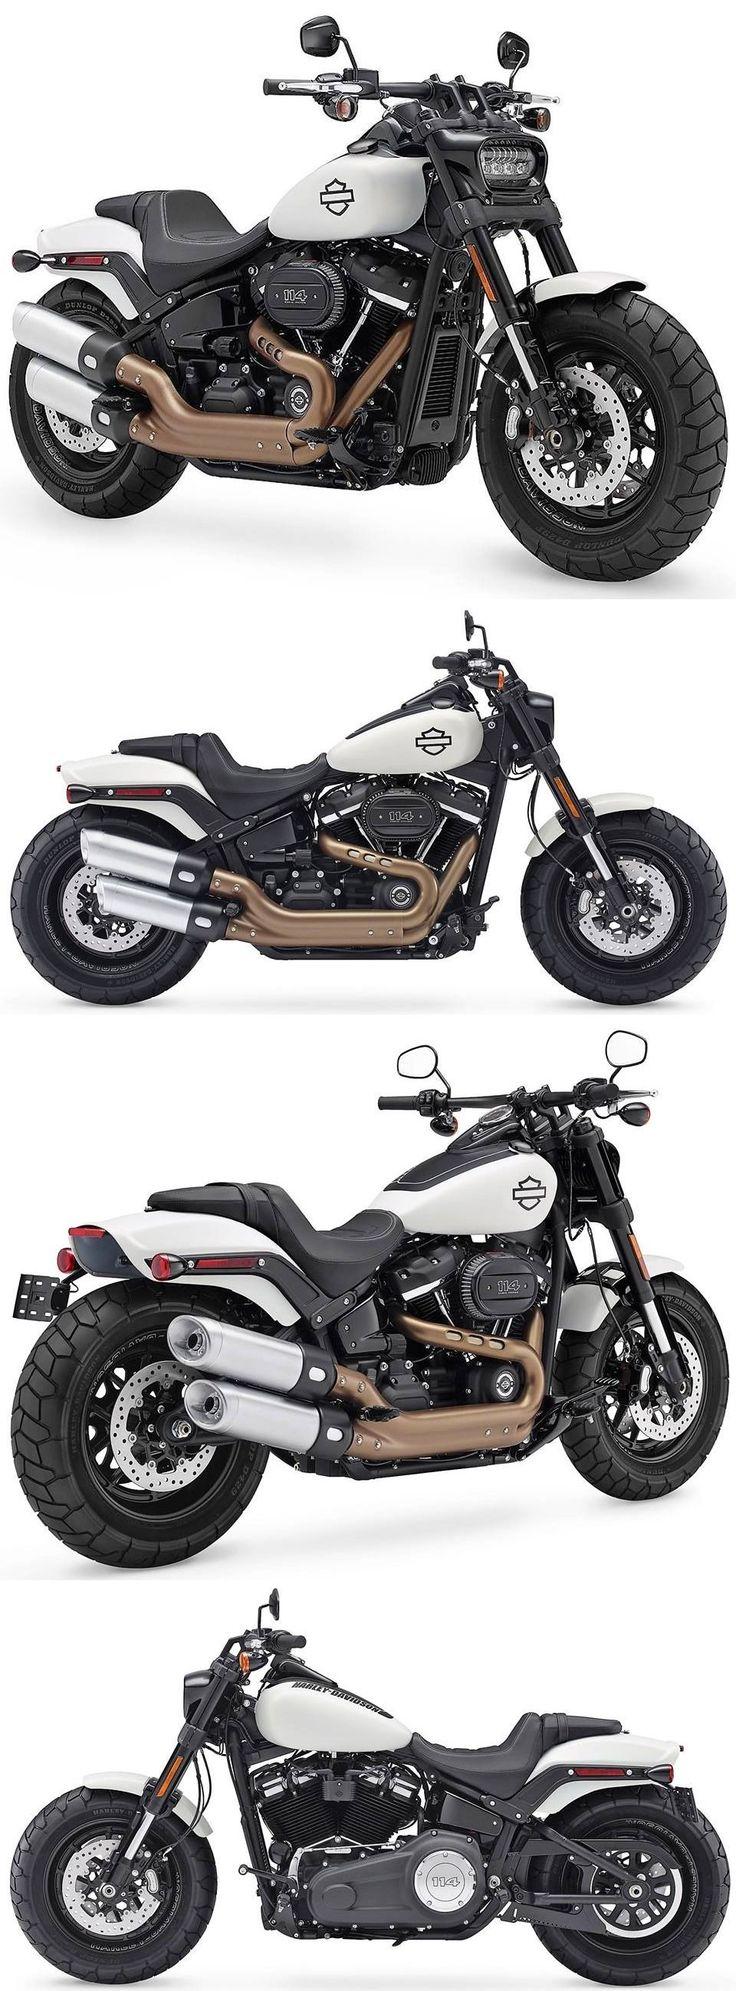 2018 Harley Davidson Fat Bob #harleydavidsonbikes